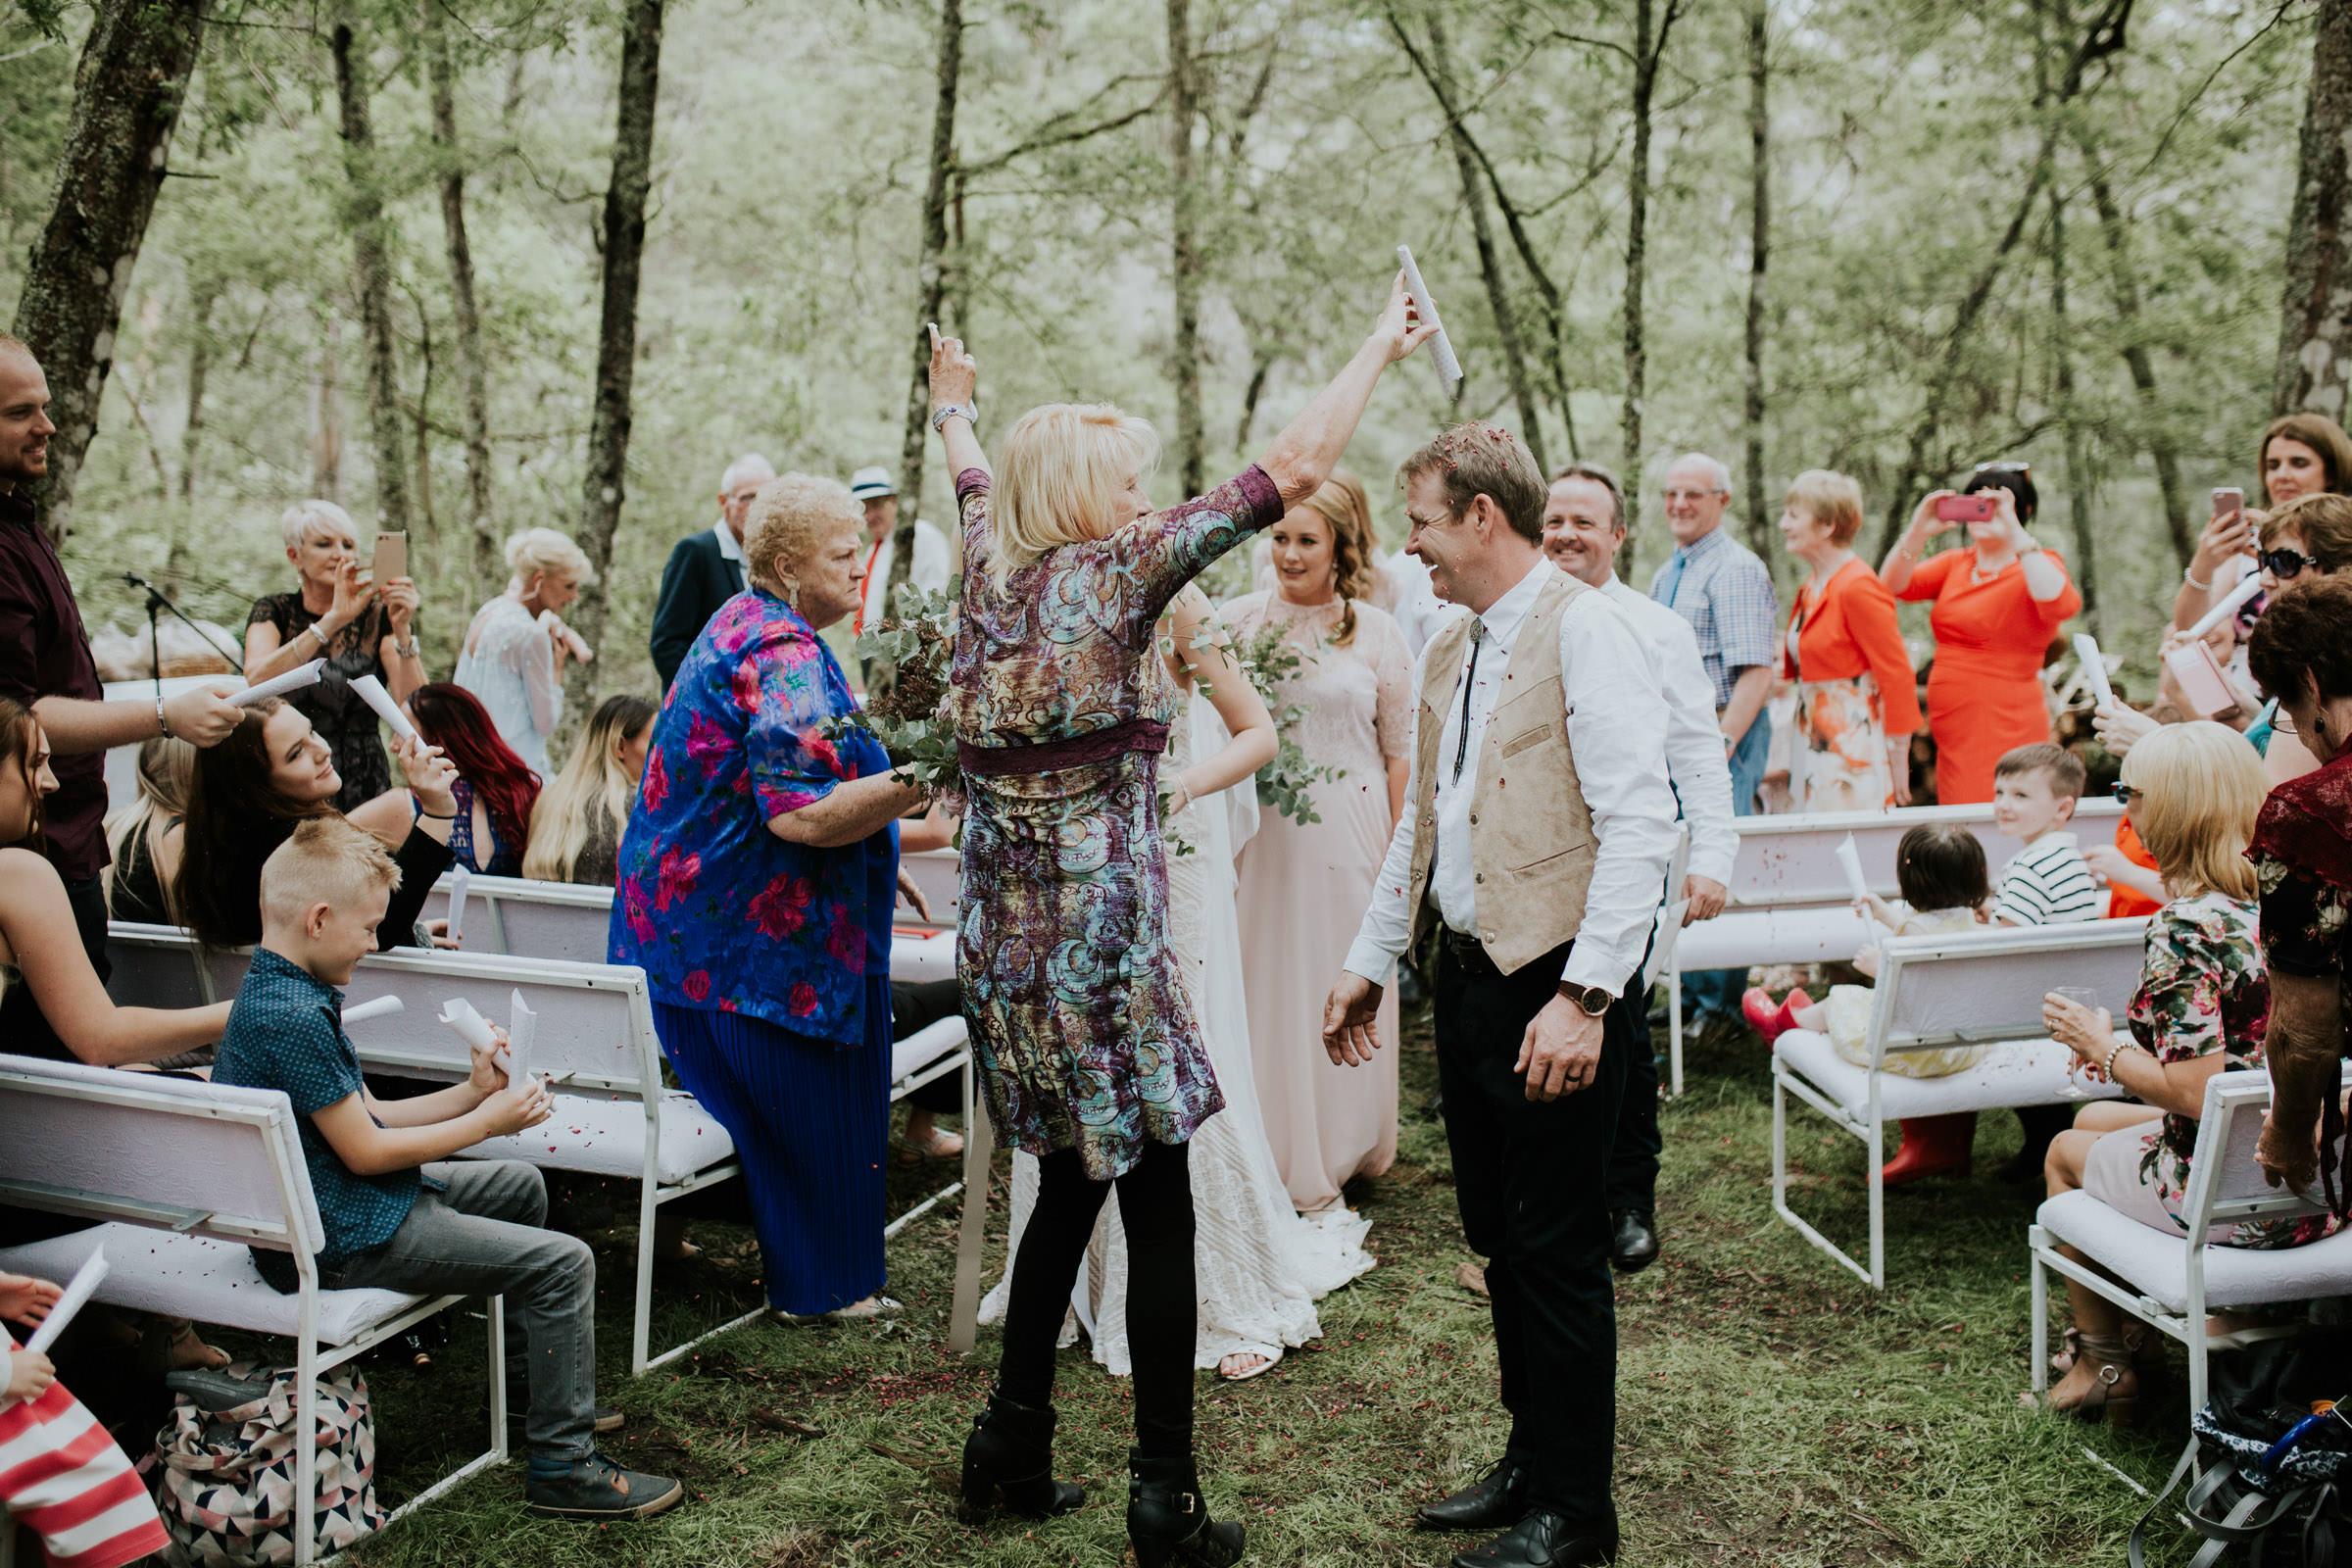 Emma+John+Far+South+Coast+Wedding+Festivl+Glamping+Bush-114.jpg